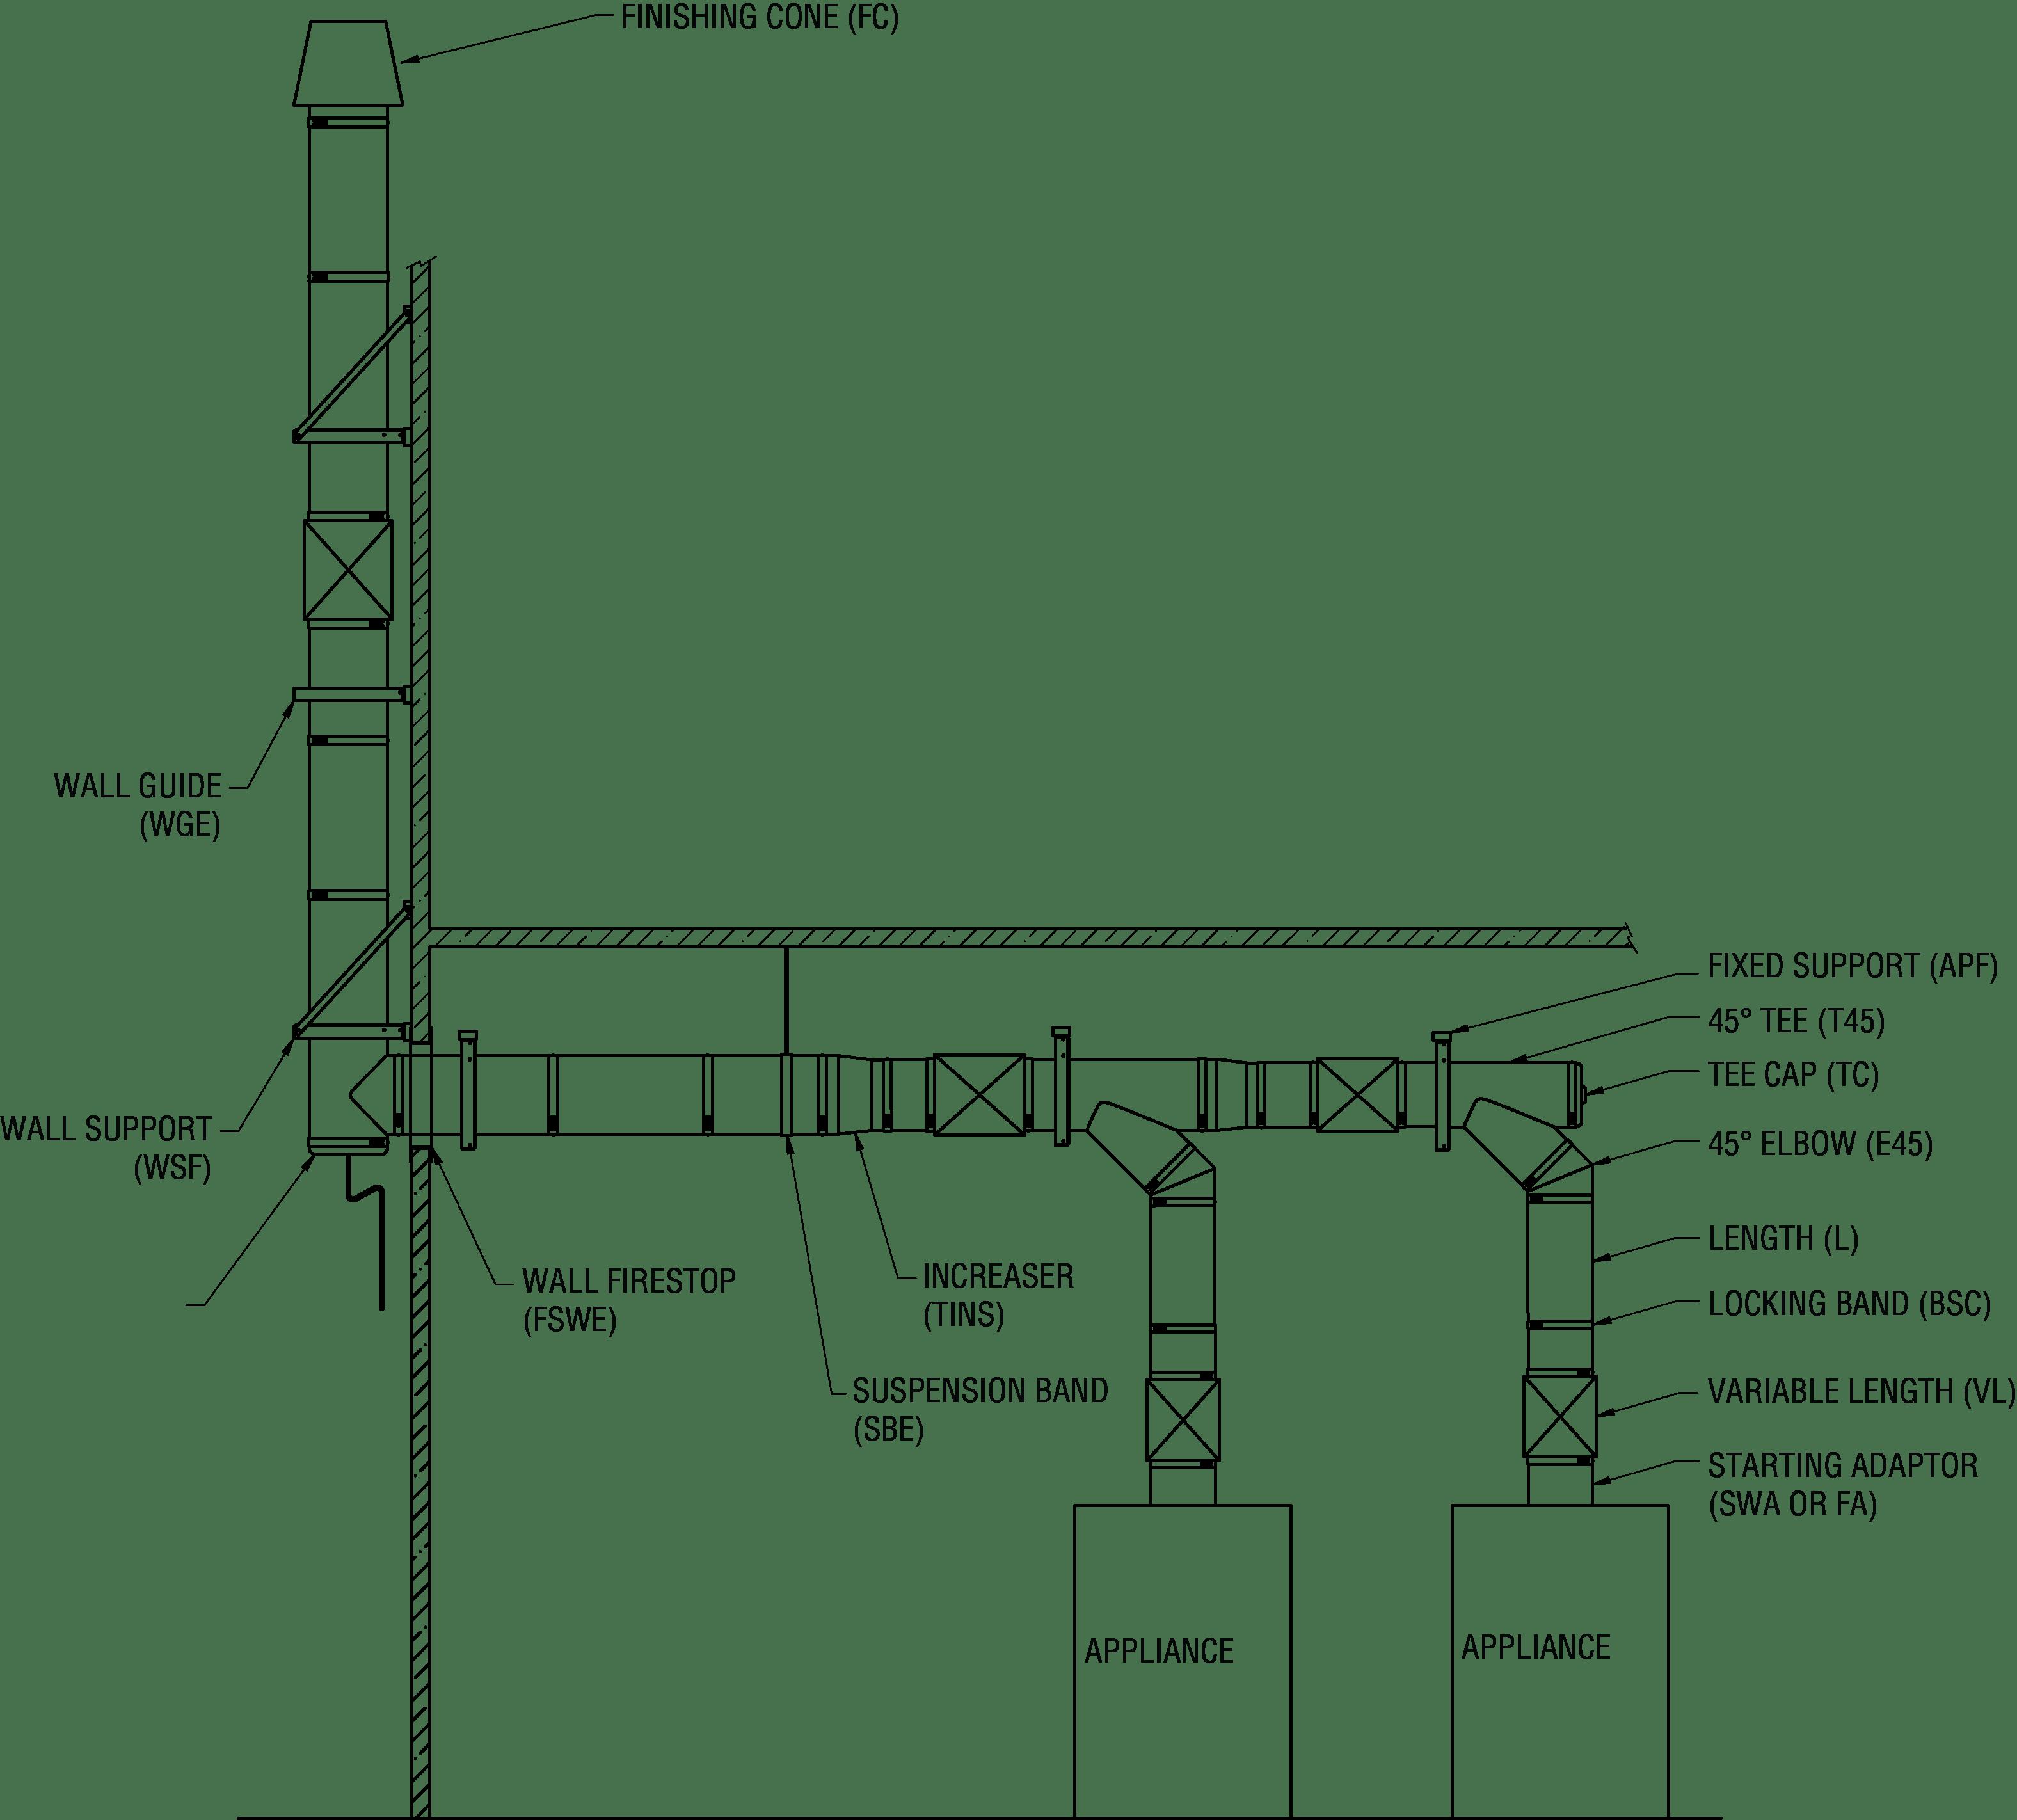 CIX - Boiler application